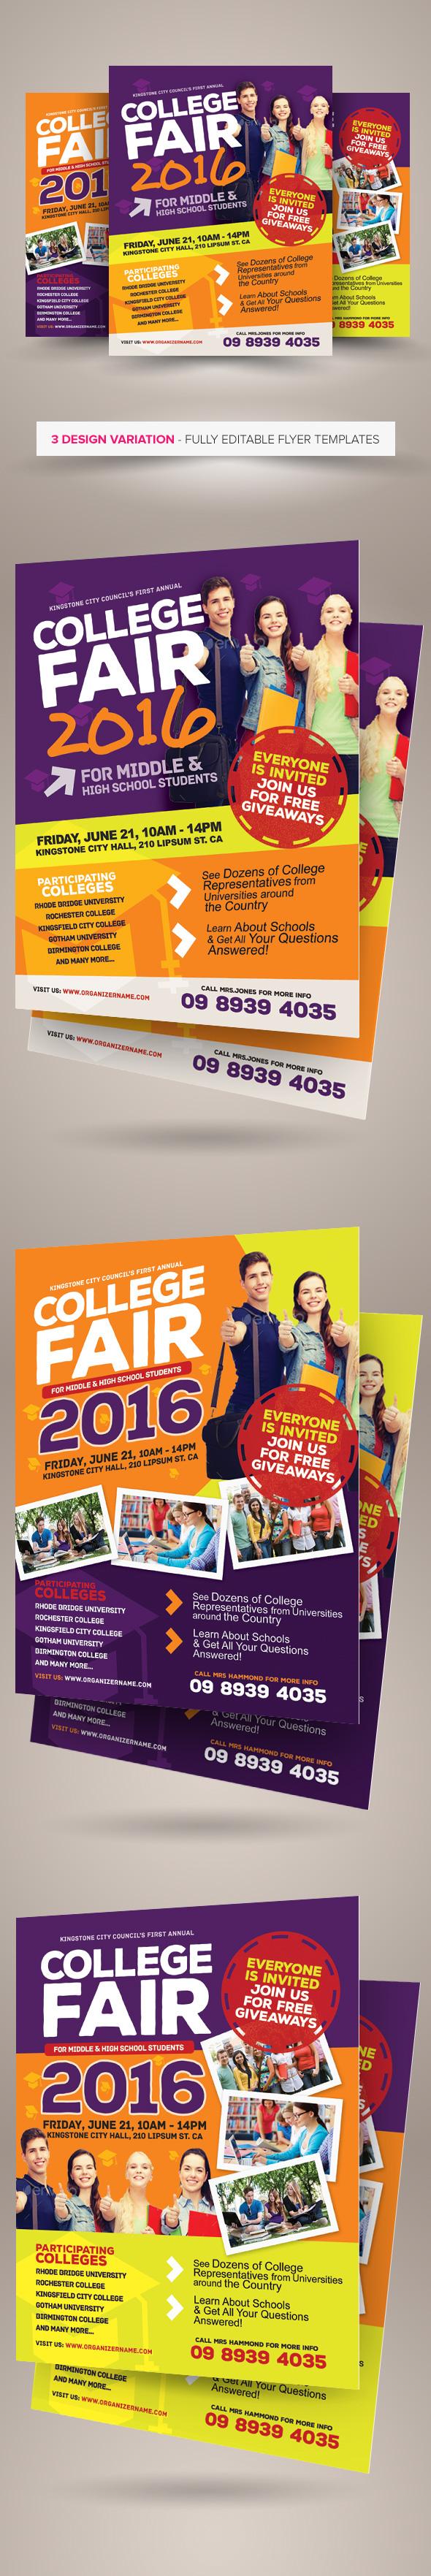 college fair flyer templates on behance